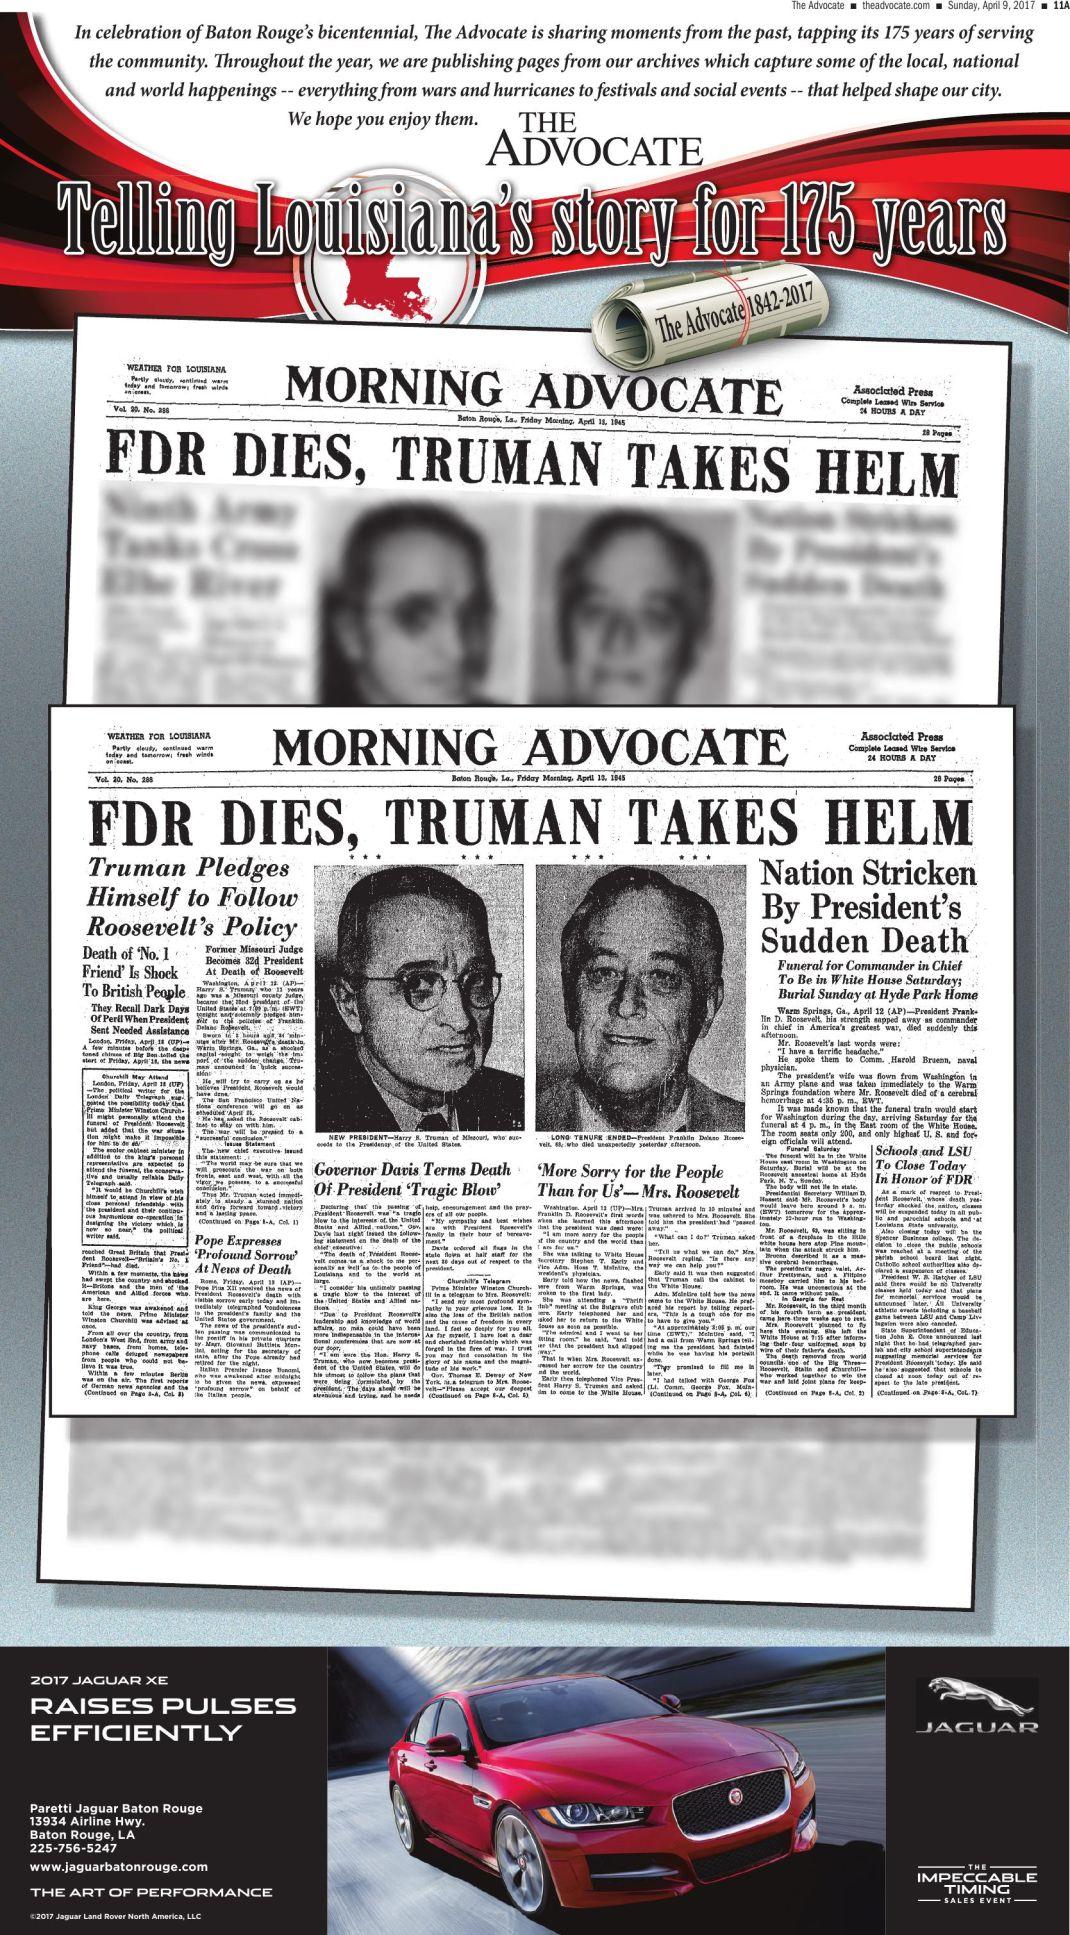 FDR Dies, Truman Takes Helm